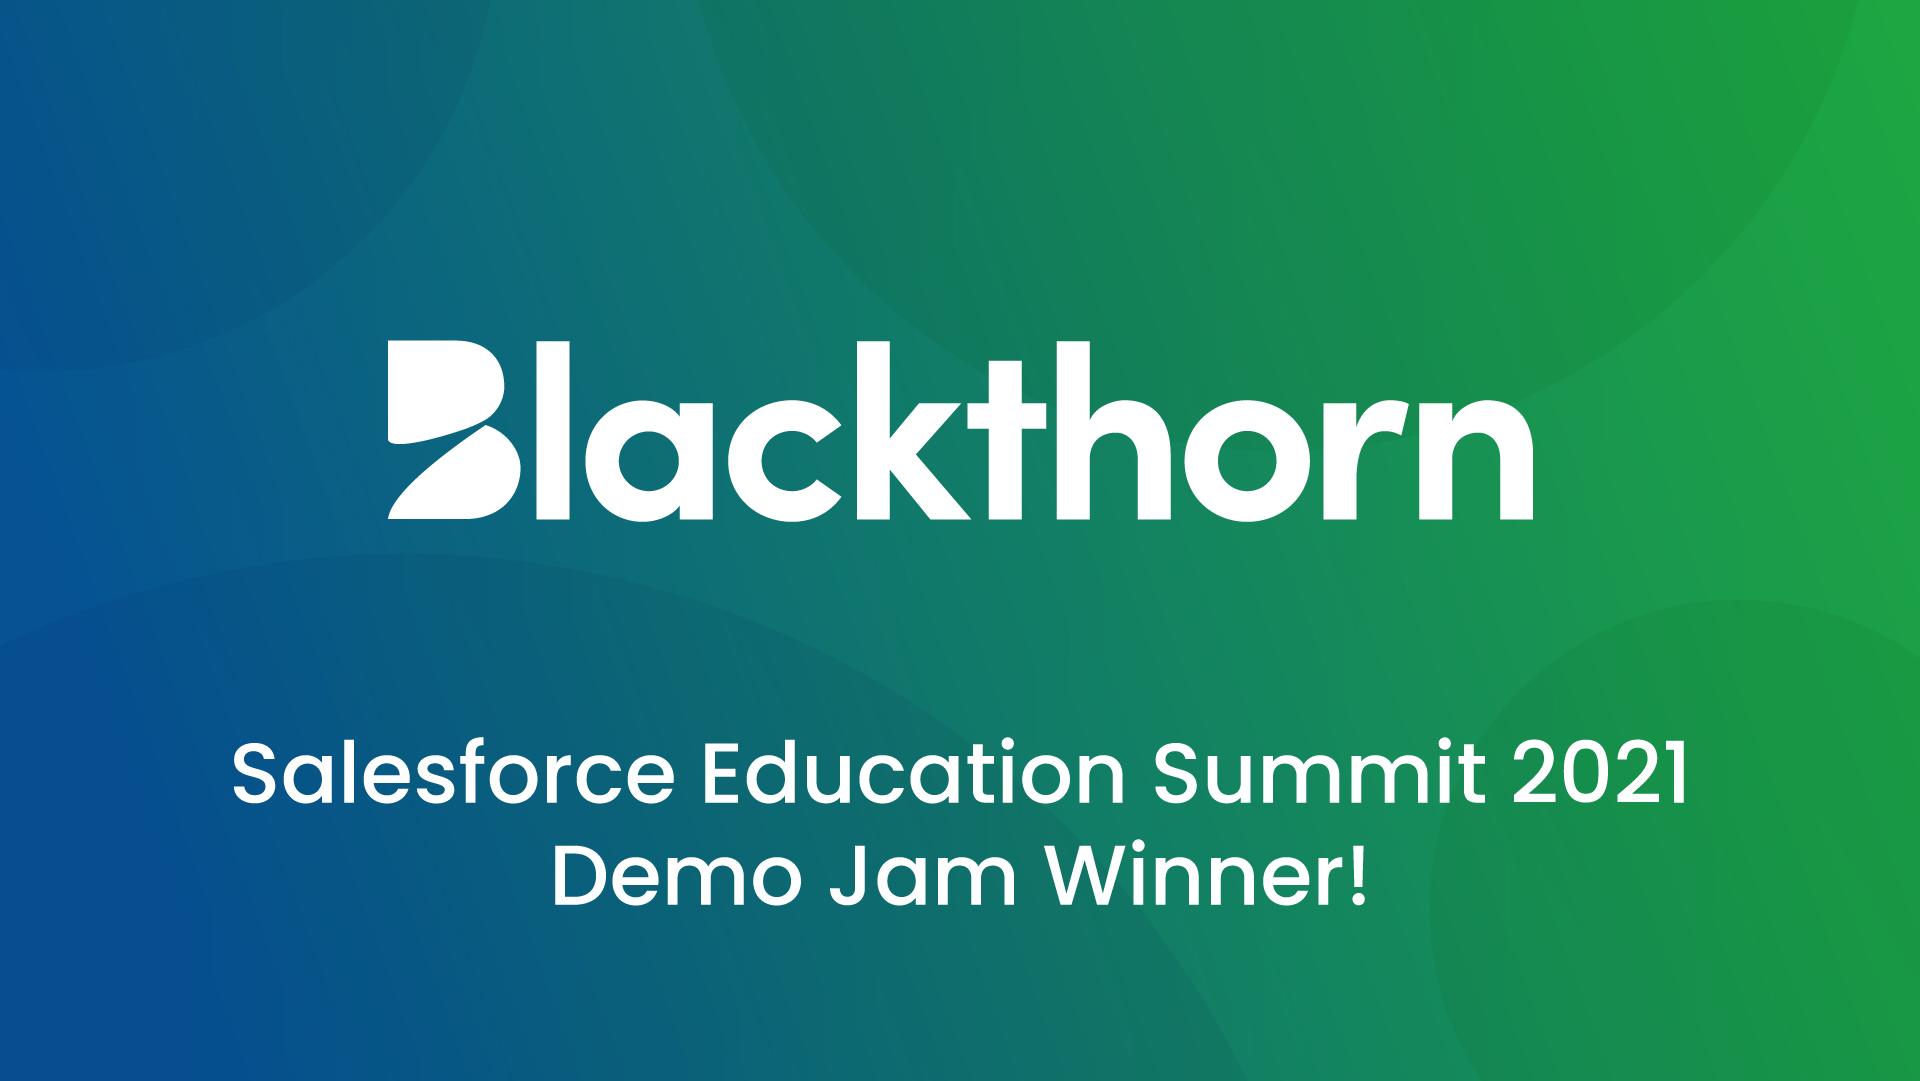 Salesforce Education Summit 2021 Demo Jam